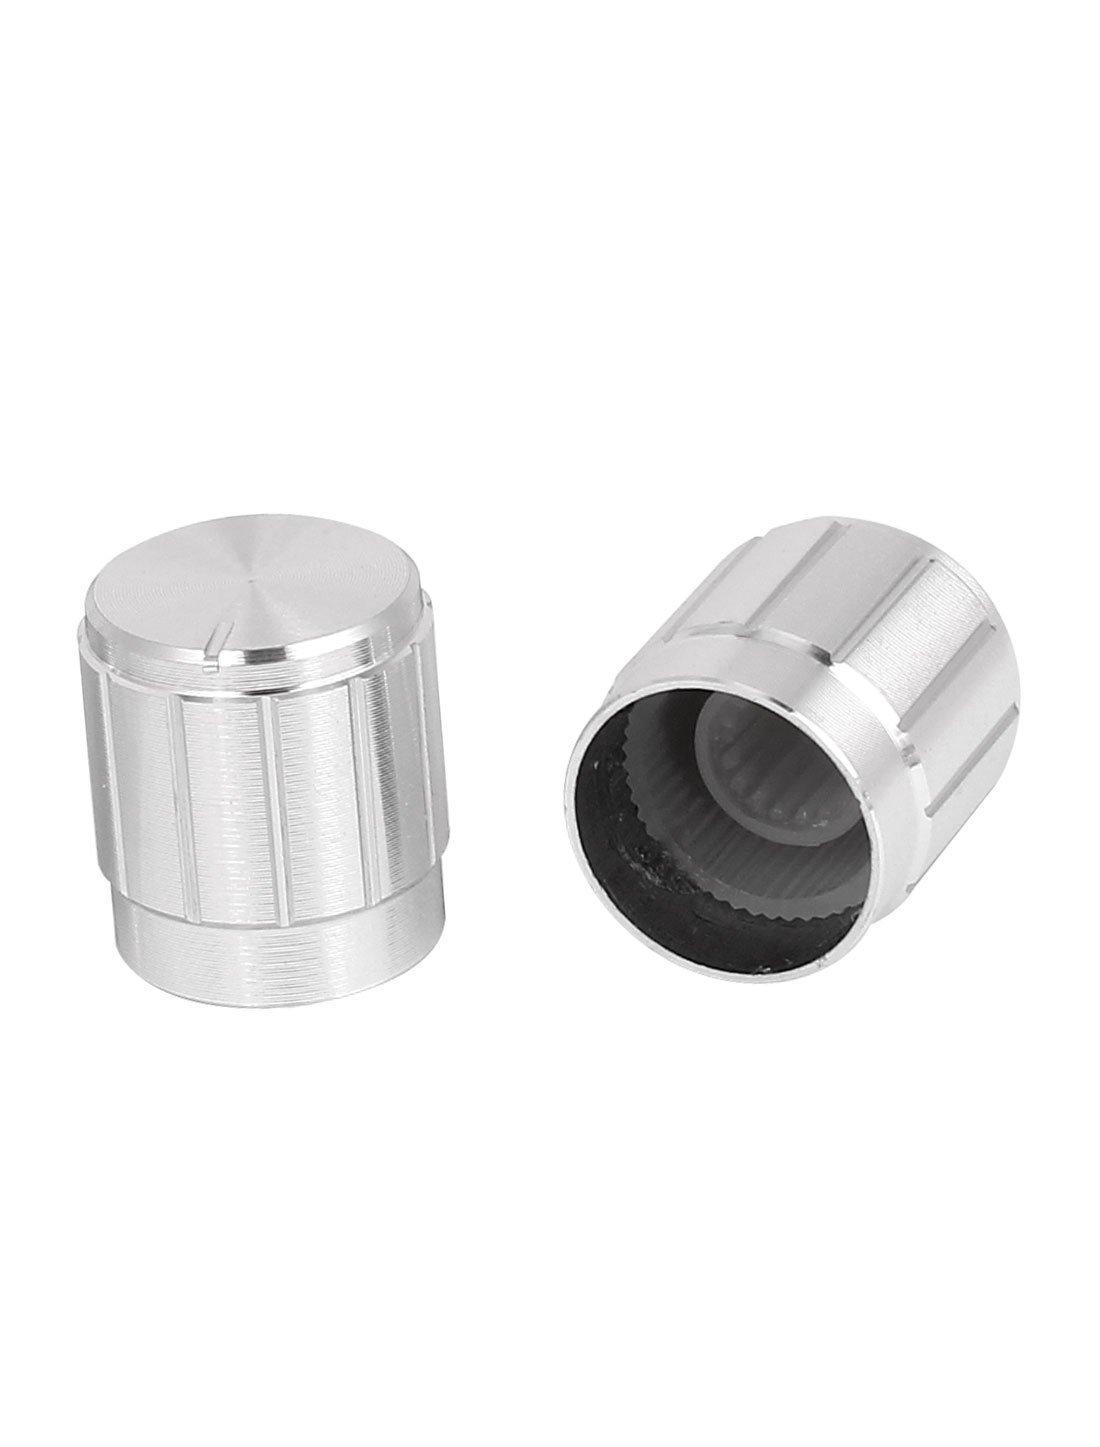 Amazon.com: eDealMax aleación de aluminio Perillas de potenciómetro del casquillo 10pcs 15x16mm tono Plata: Electronics